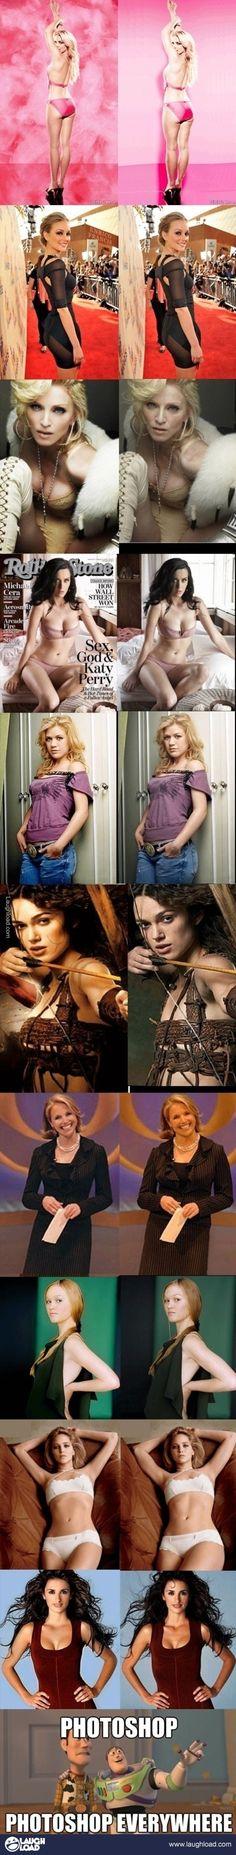 Photoshop Everywhere